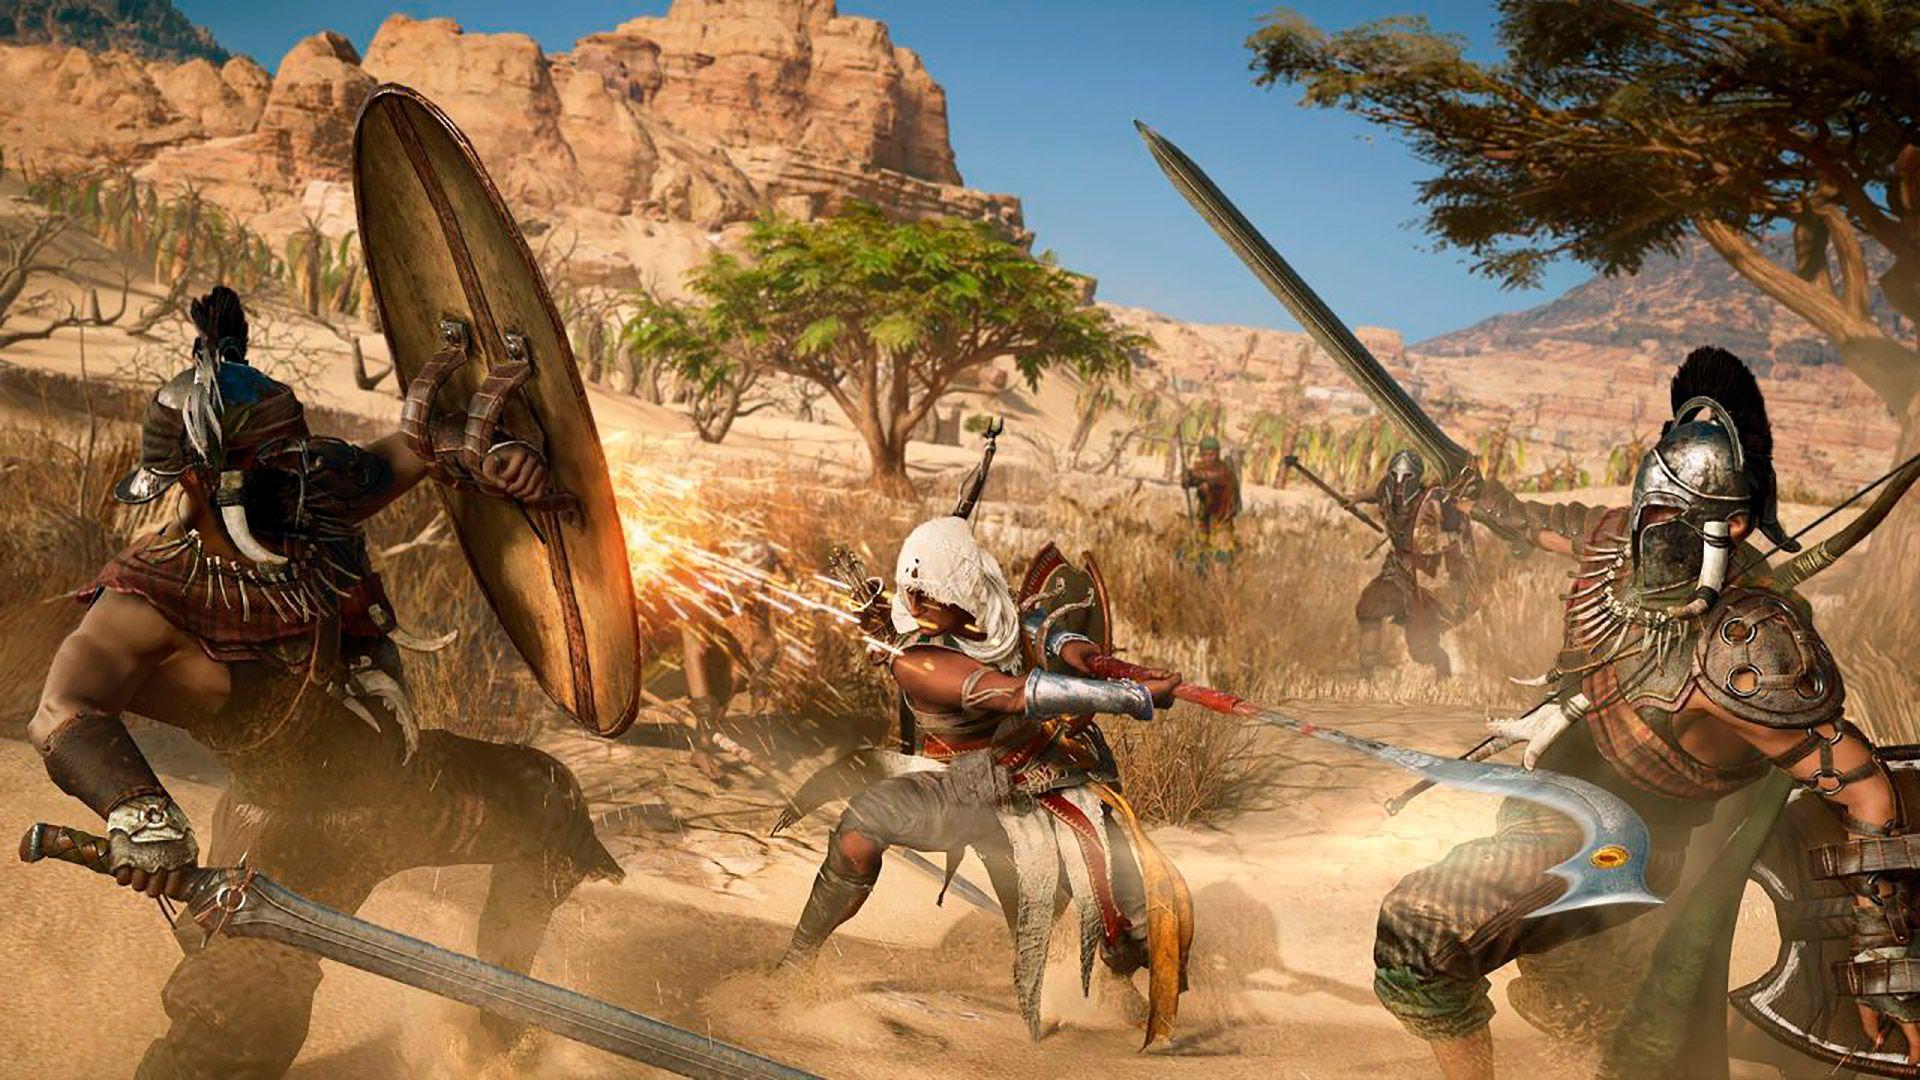 Assassin's Creed Истоки изображение 5